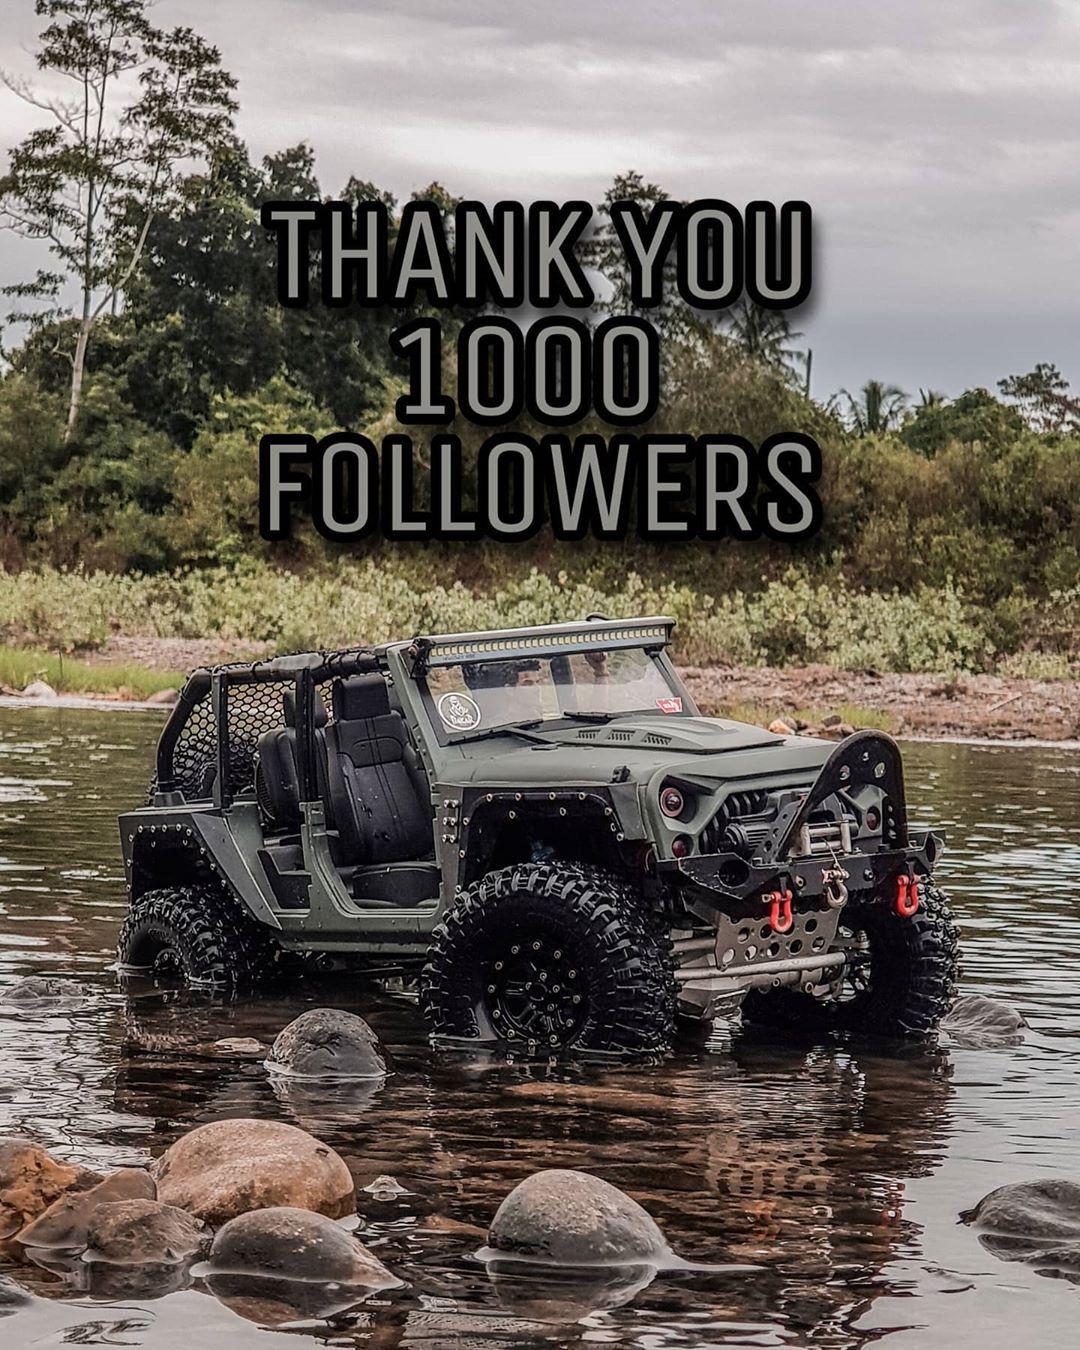 "RC Nekad on Instagram: ""#rcadventureindonesia #1000followers #thankyou1000followers #rcoffroadindonesia #axial #traxxas #capo #mountaintrailrc #rcrockcrawler…"""